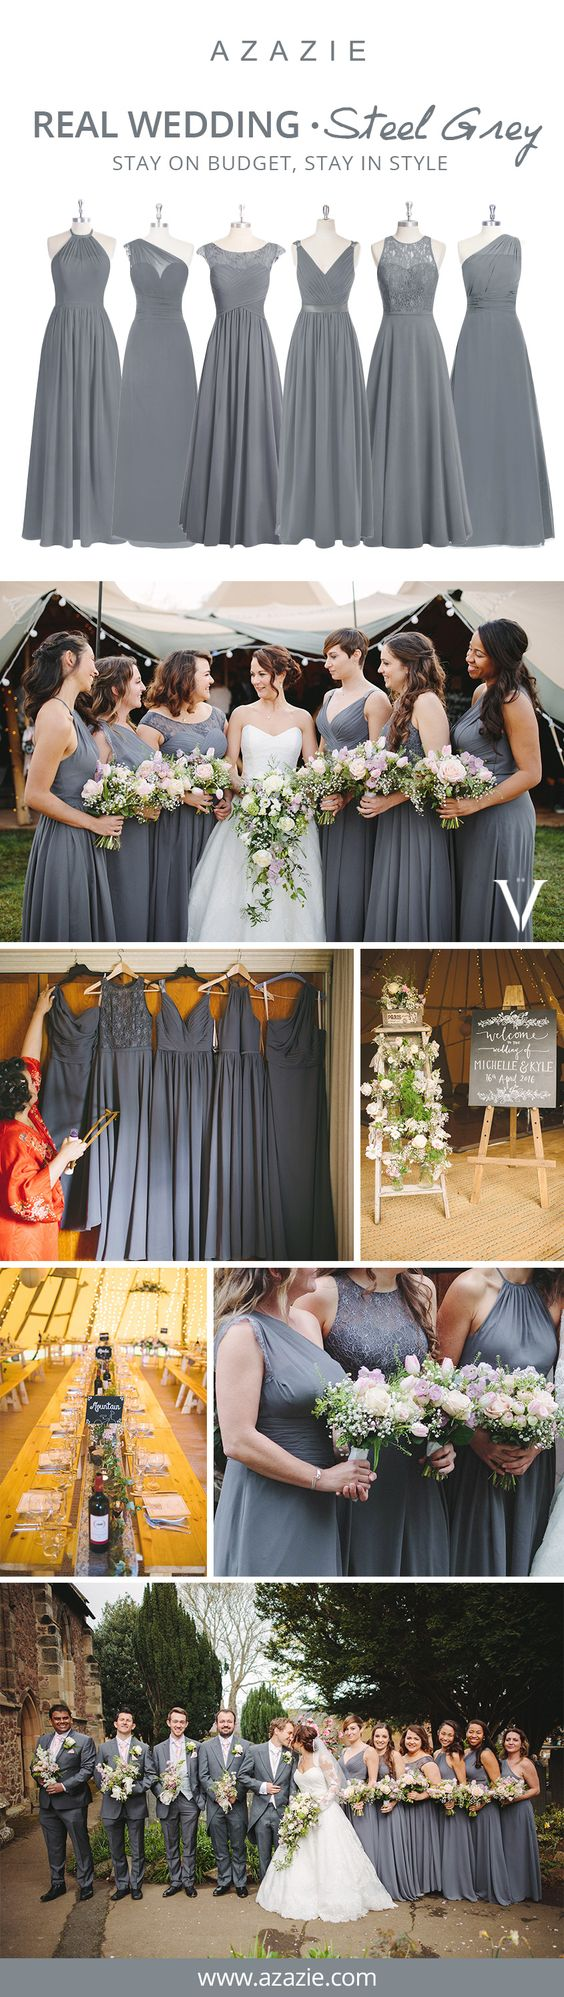 1920's wedding decorations ideas november 2018 Mackenna Riley sahweetbeaver on Pinterest